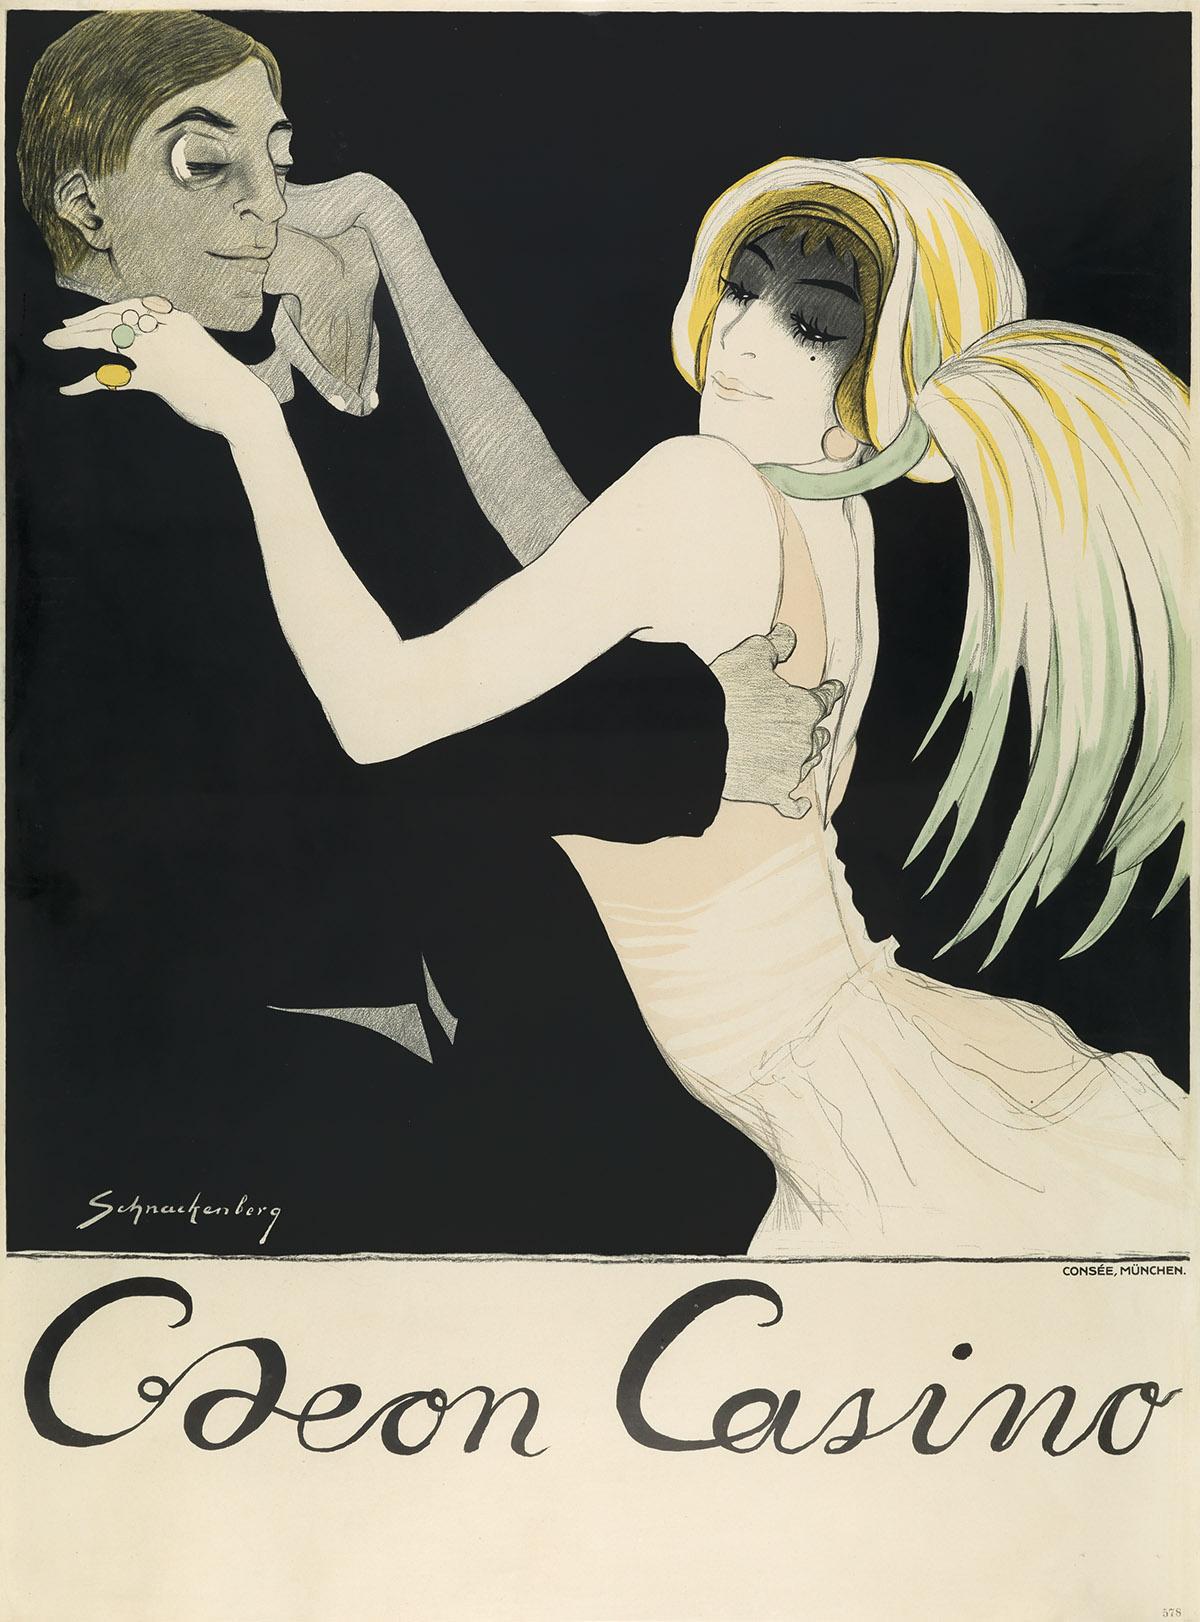 WALTER SCHNACKENBERG (1880-1961). ODEON CASINO. 1912. 47x35 inches, 119x89 cm. Consée, Munich.